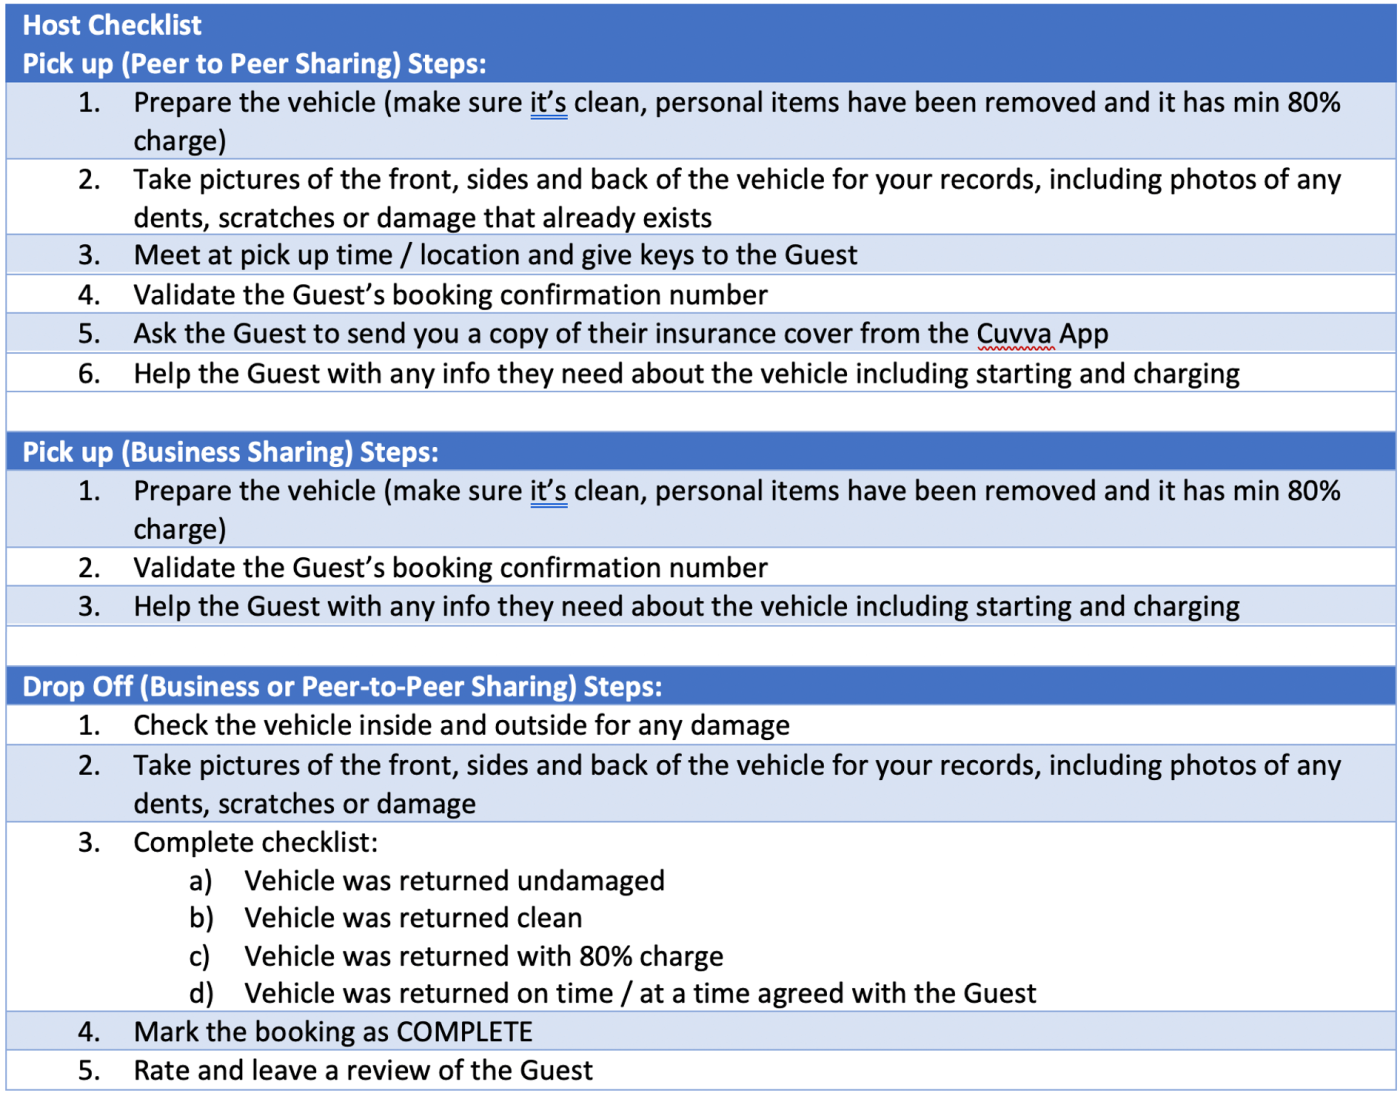 Table 4 Host Checklist